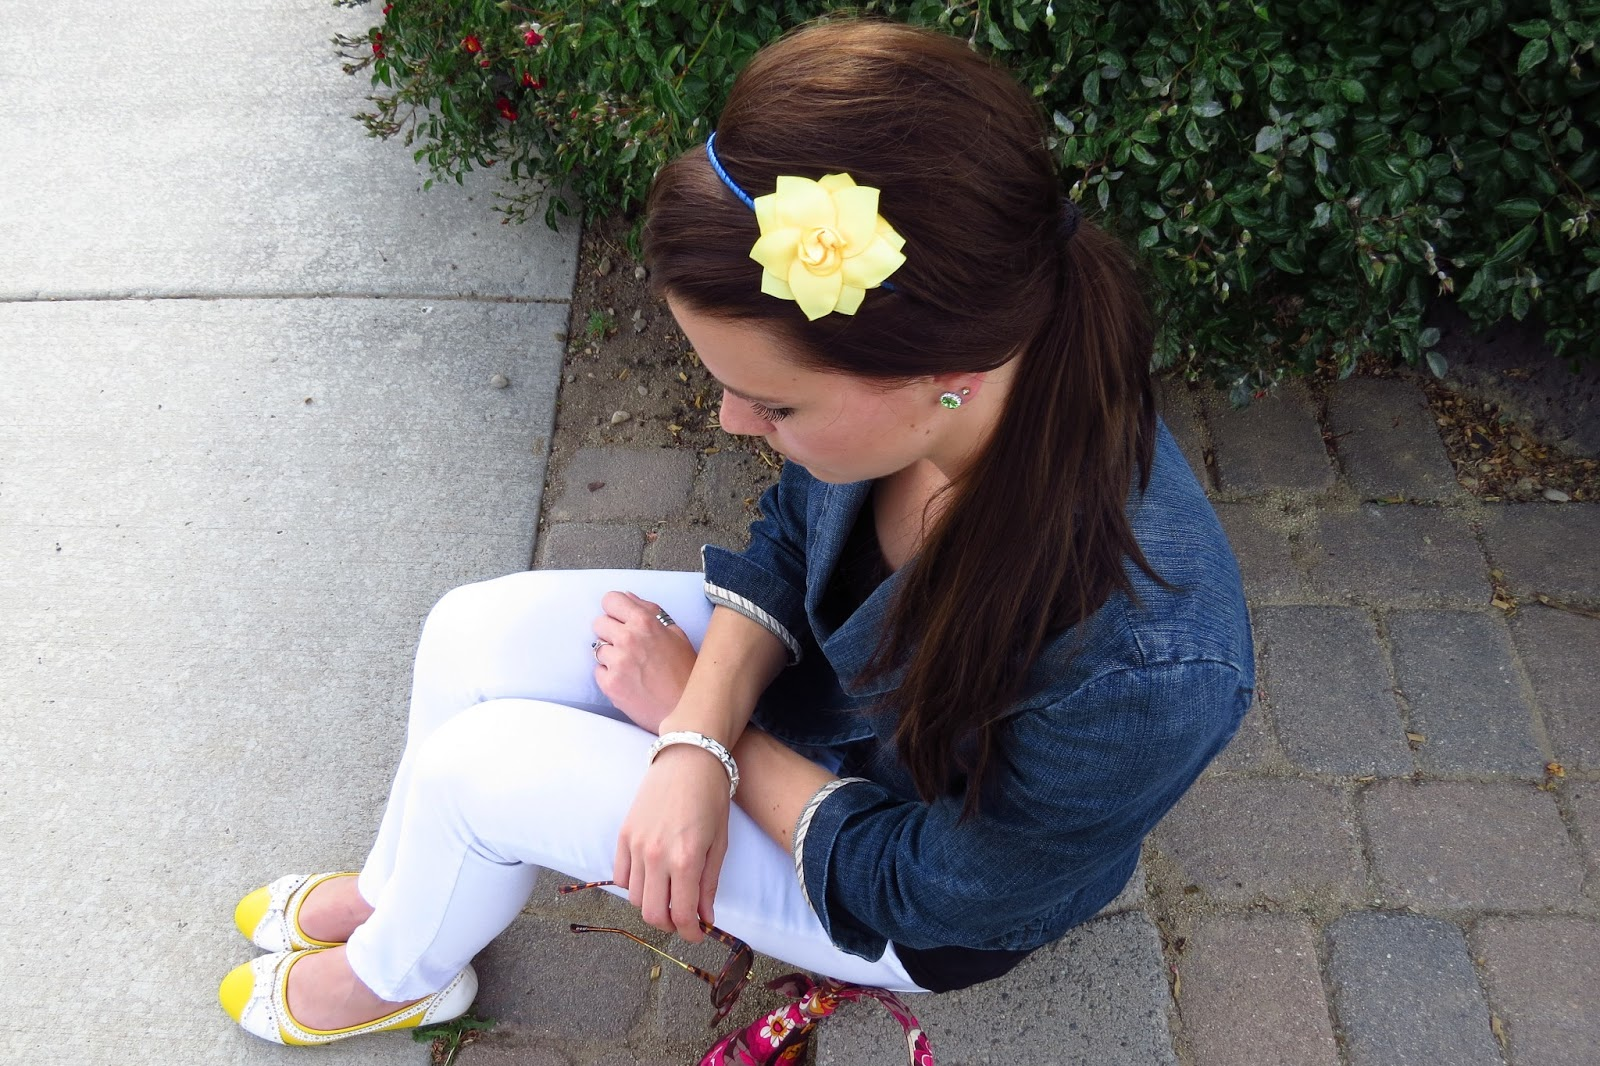 denim blazer, white pants, yellow flower headband